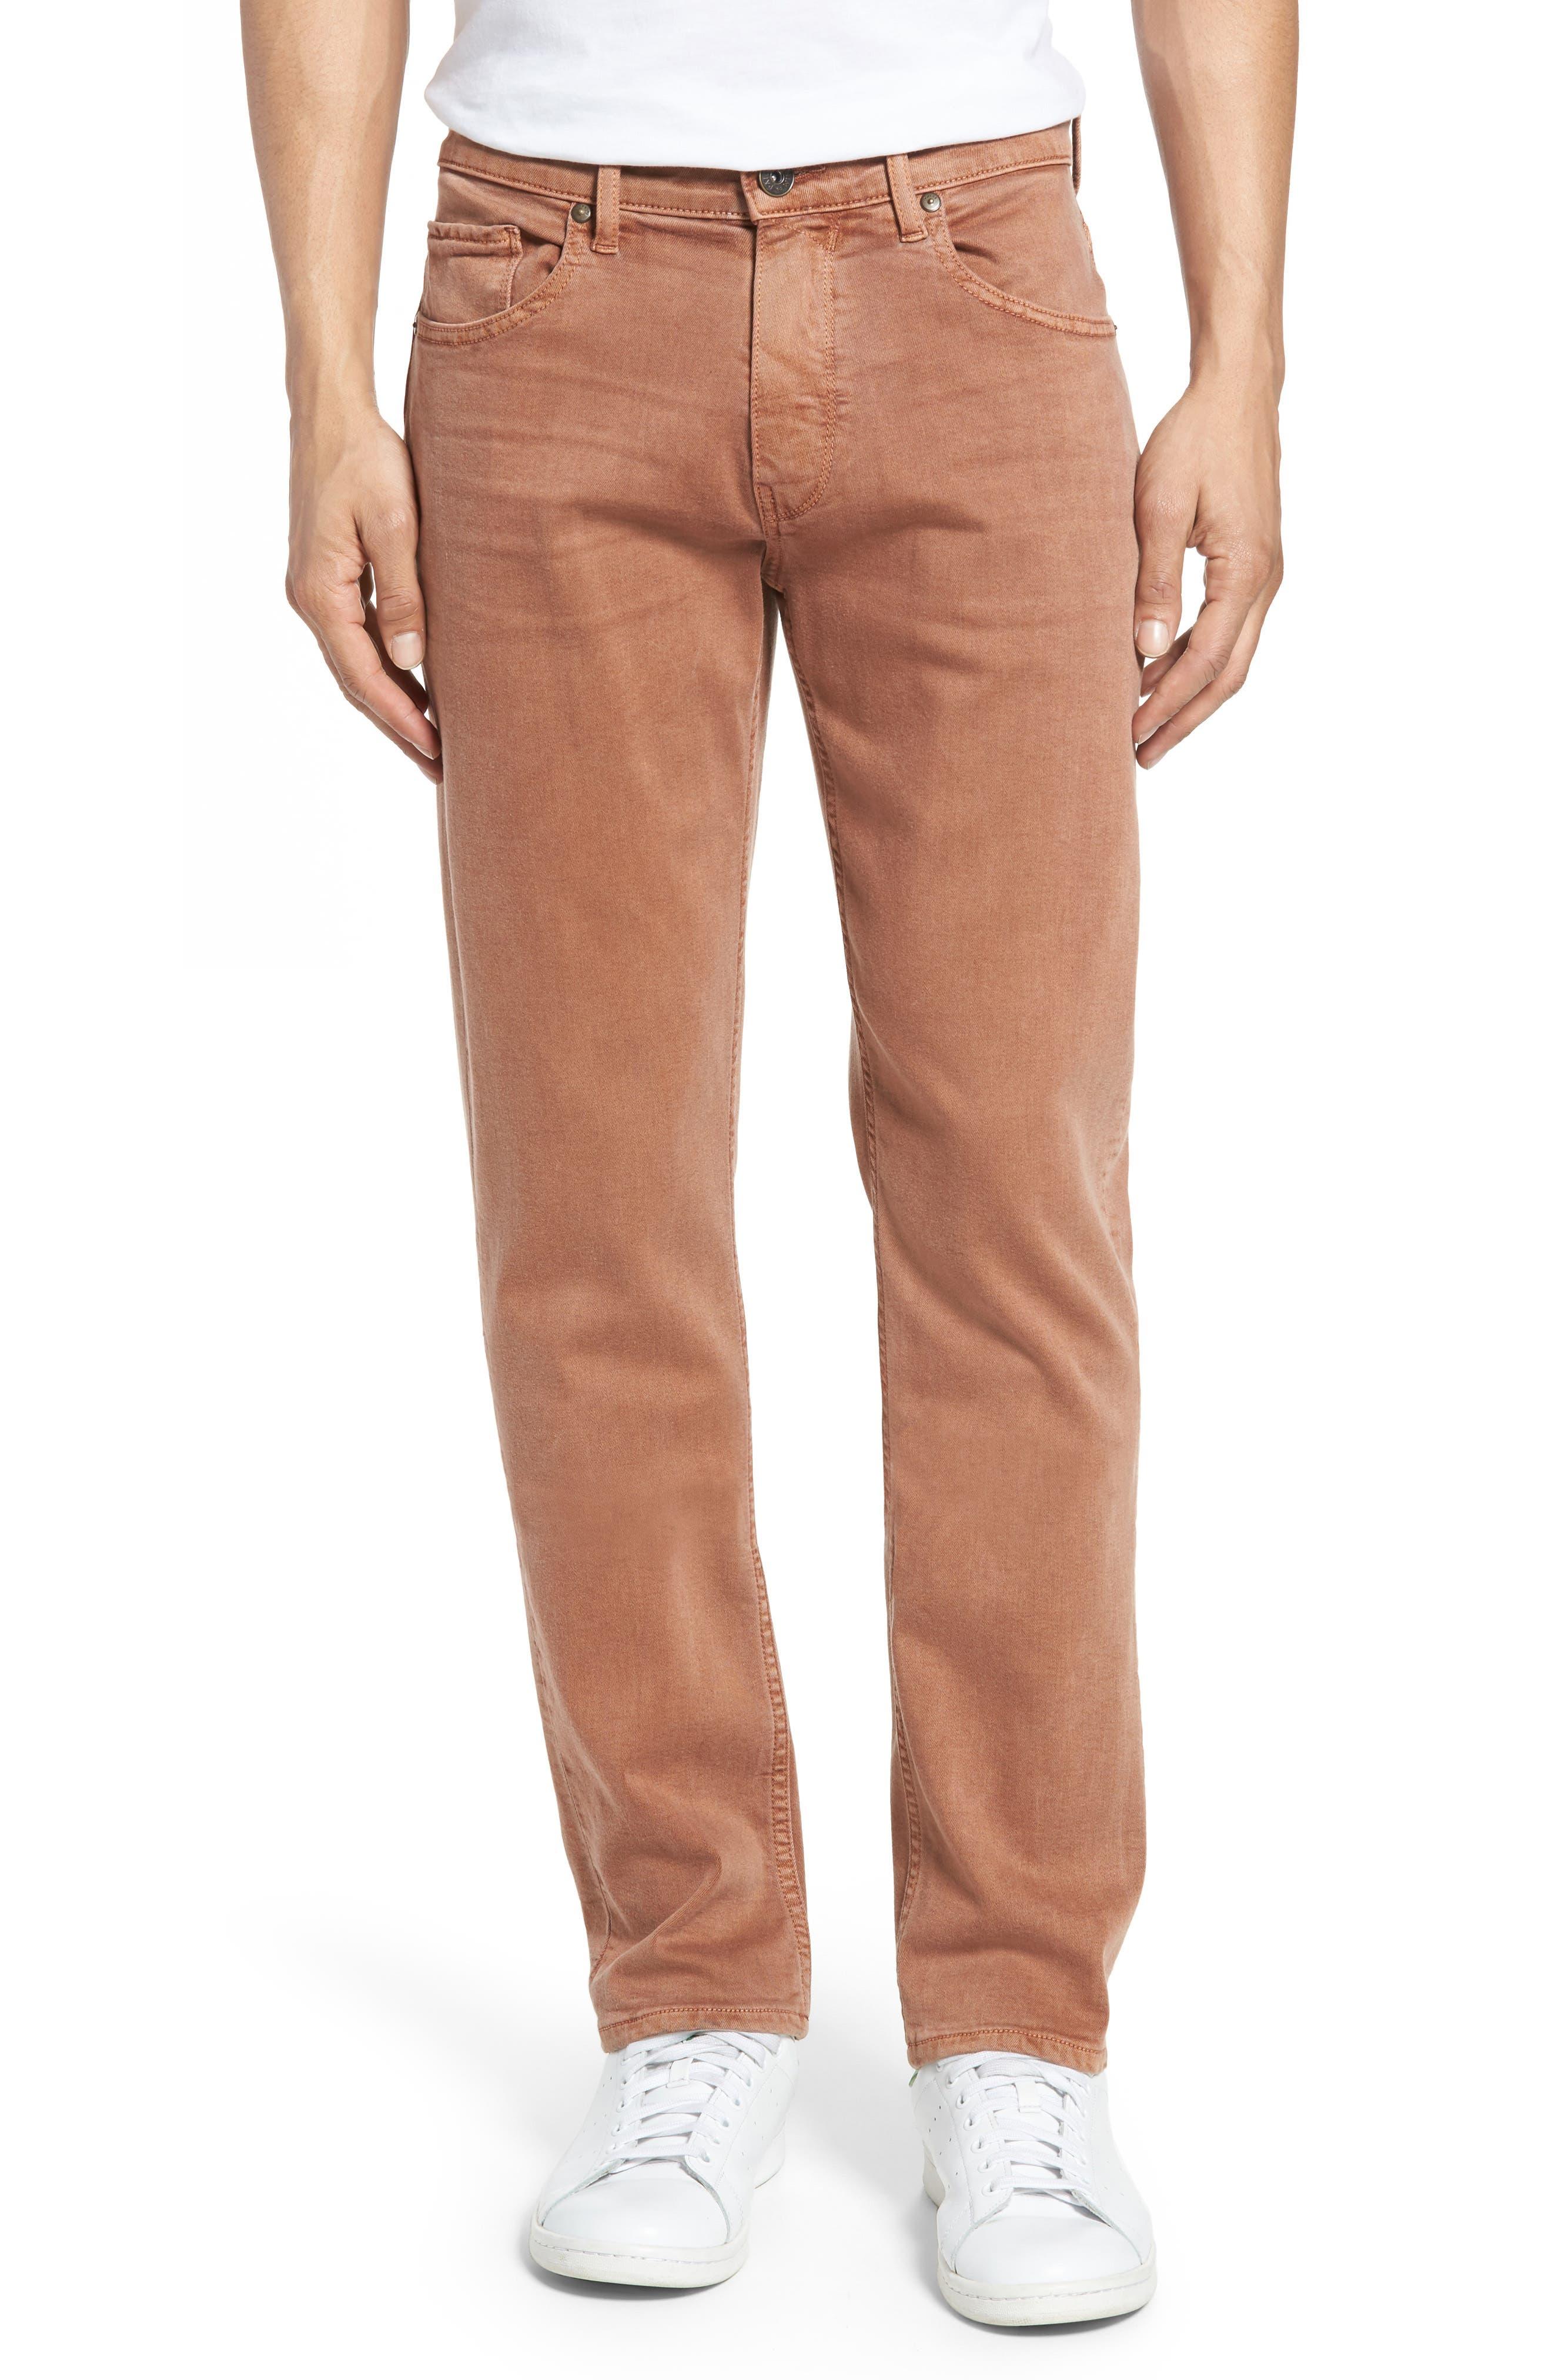 Alternate Image 1 Selected - PAIGE Transcend - Federal Slim Straight Leg Jeans (Vintage Bronzed)